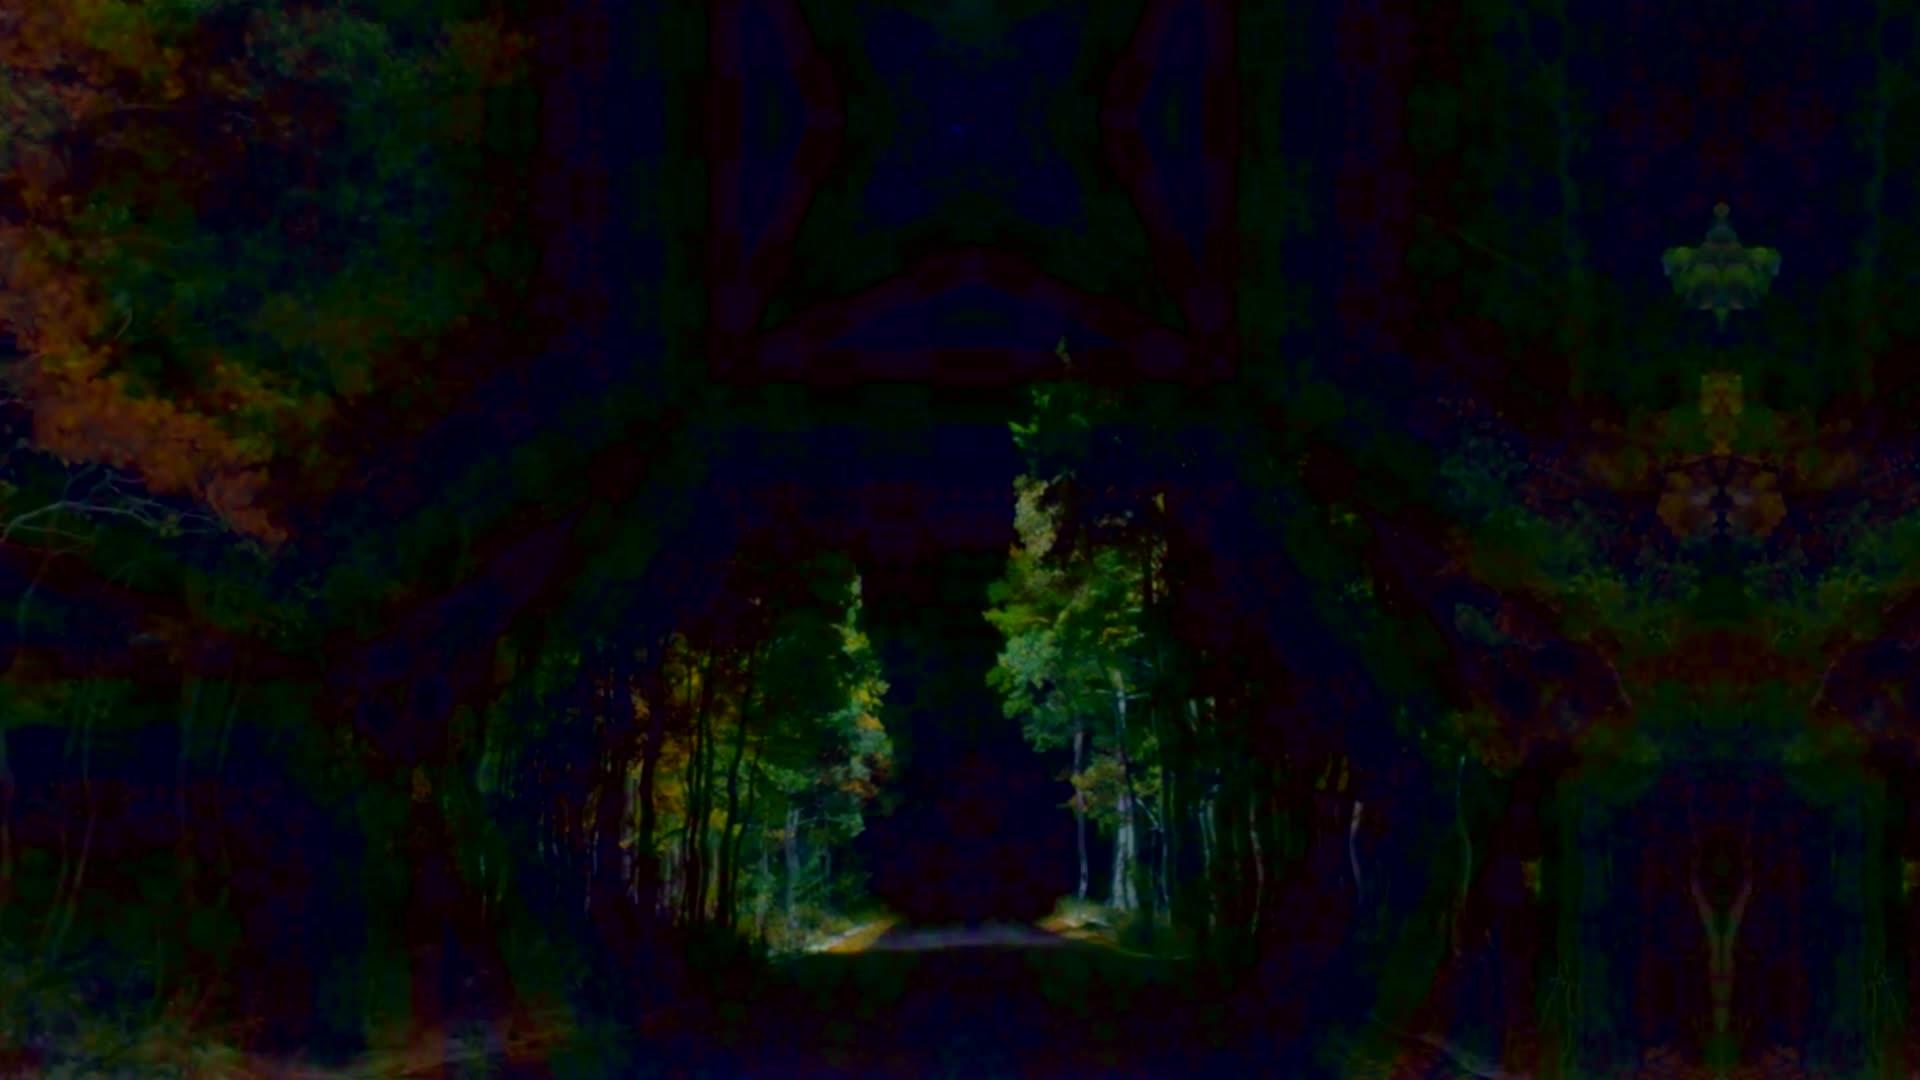 replications, Nighttime Rainbow Road GIFs